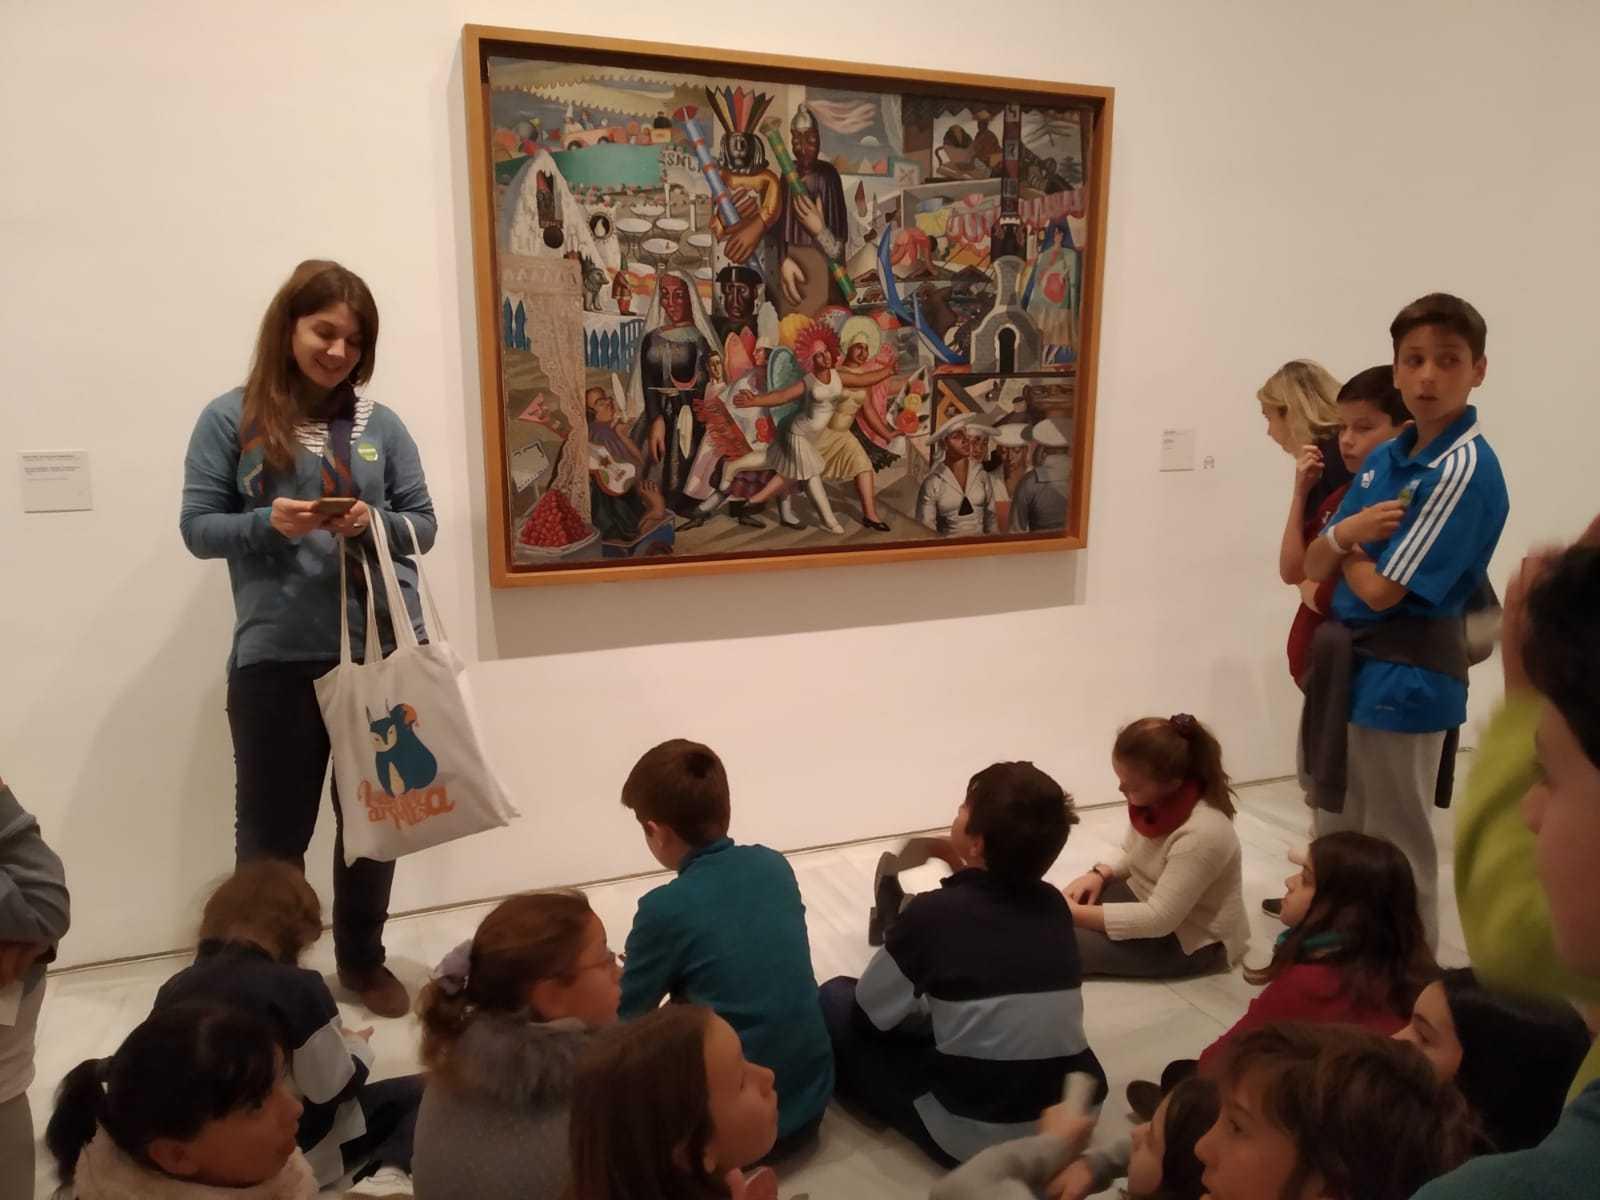 2019_02_07_Quinto visita Museo Reina Sofia_CEIP FDLR_Las Rozas